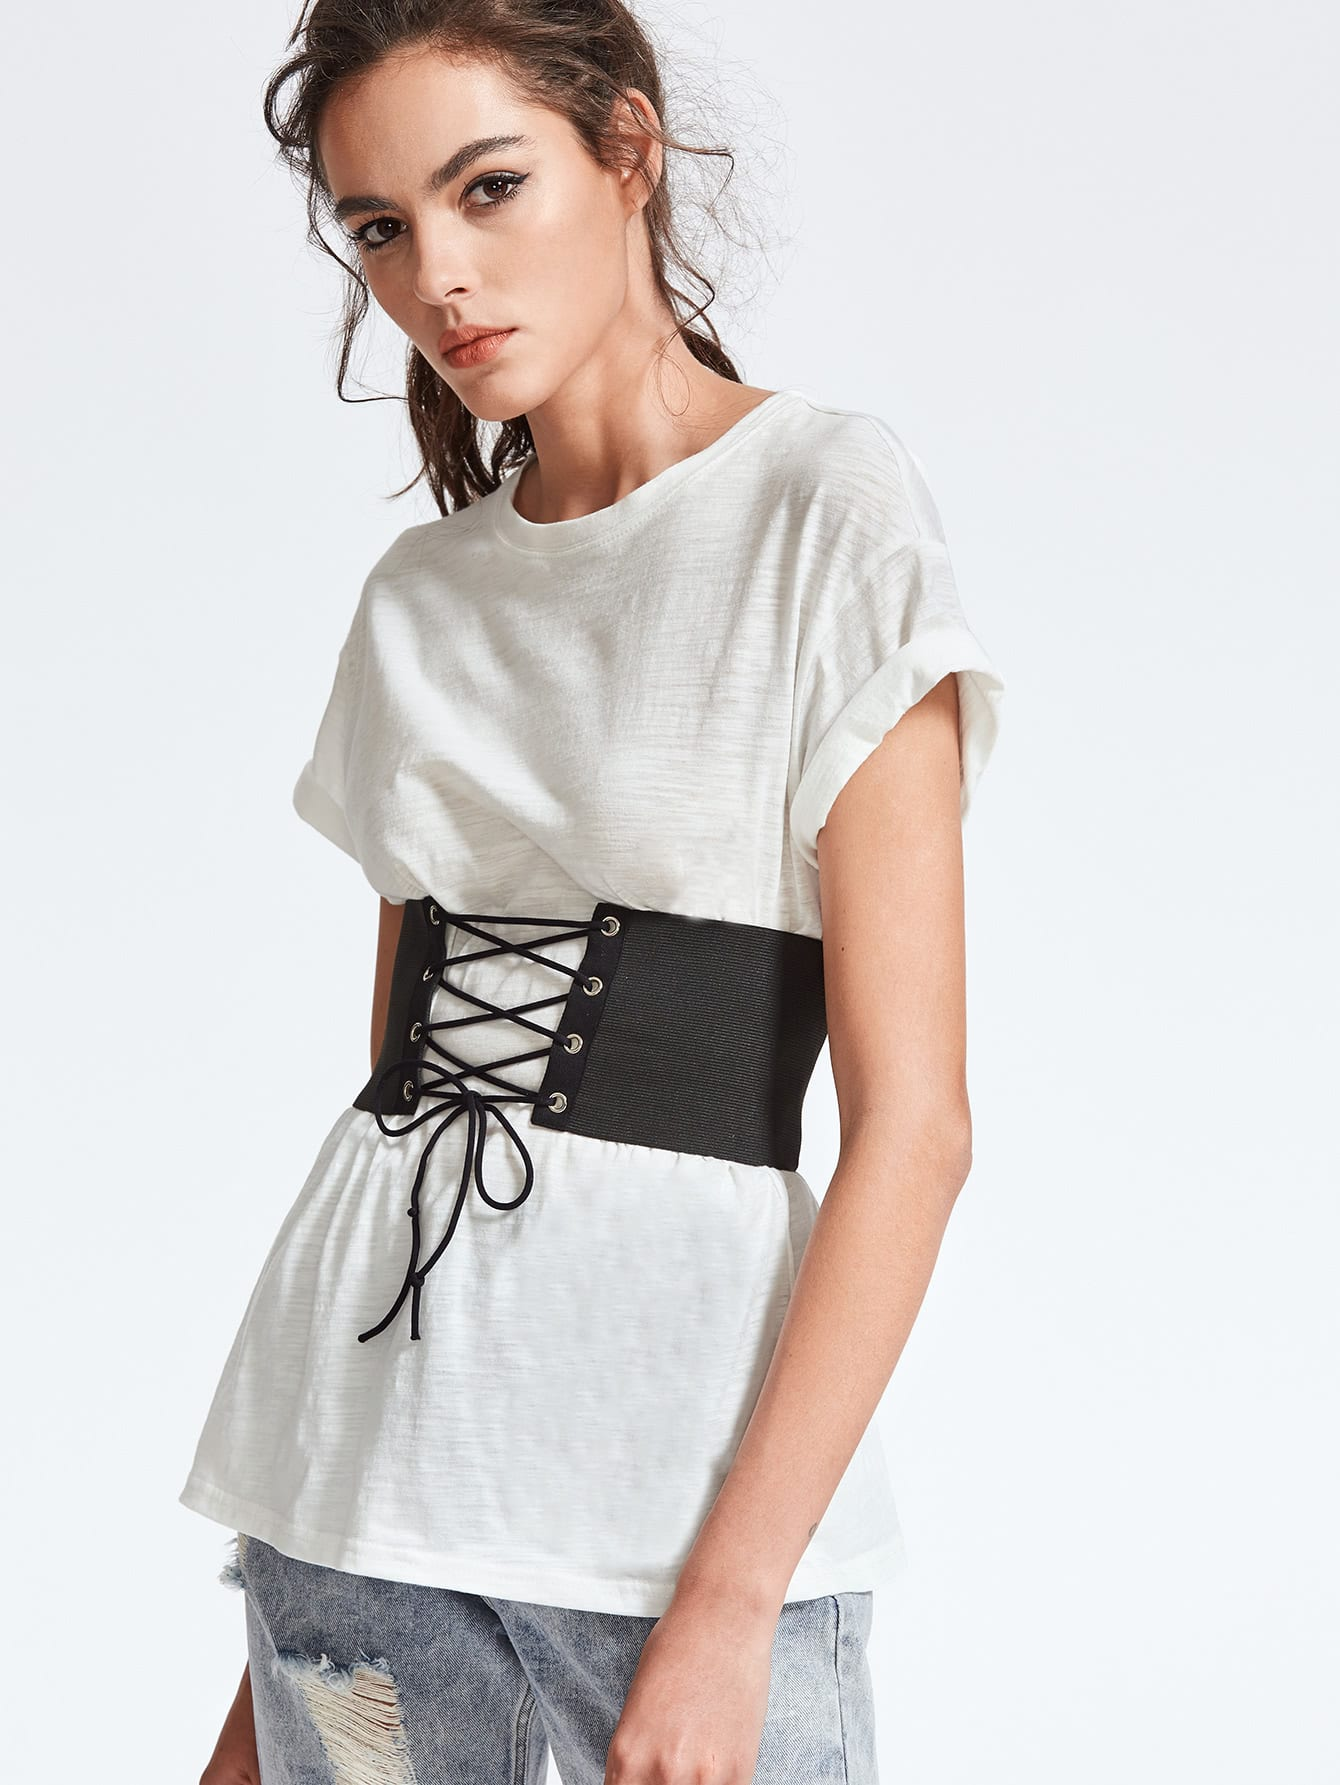 Drop Shoulder Slub T-shirt With Lace Up Wide Belt drop shoulder marled sweatshirt dress with corset belt